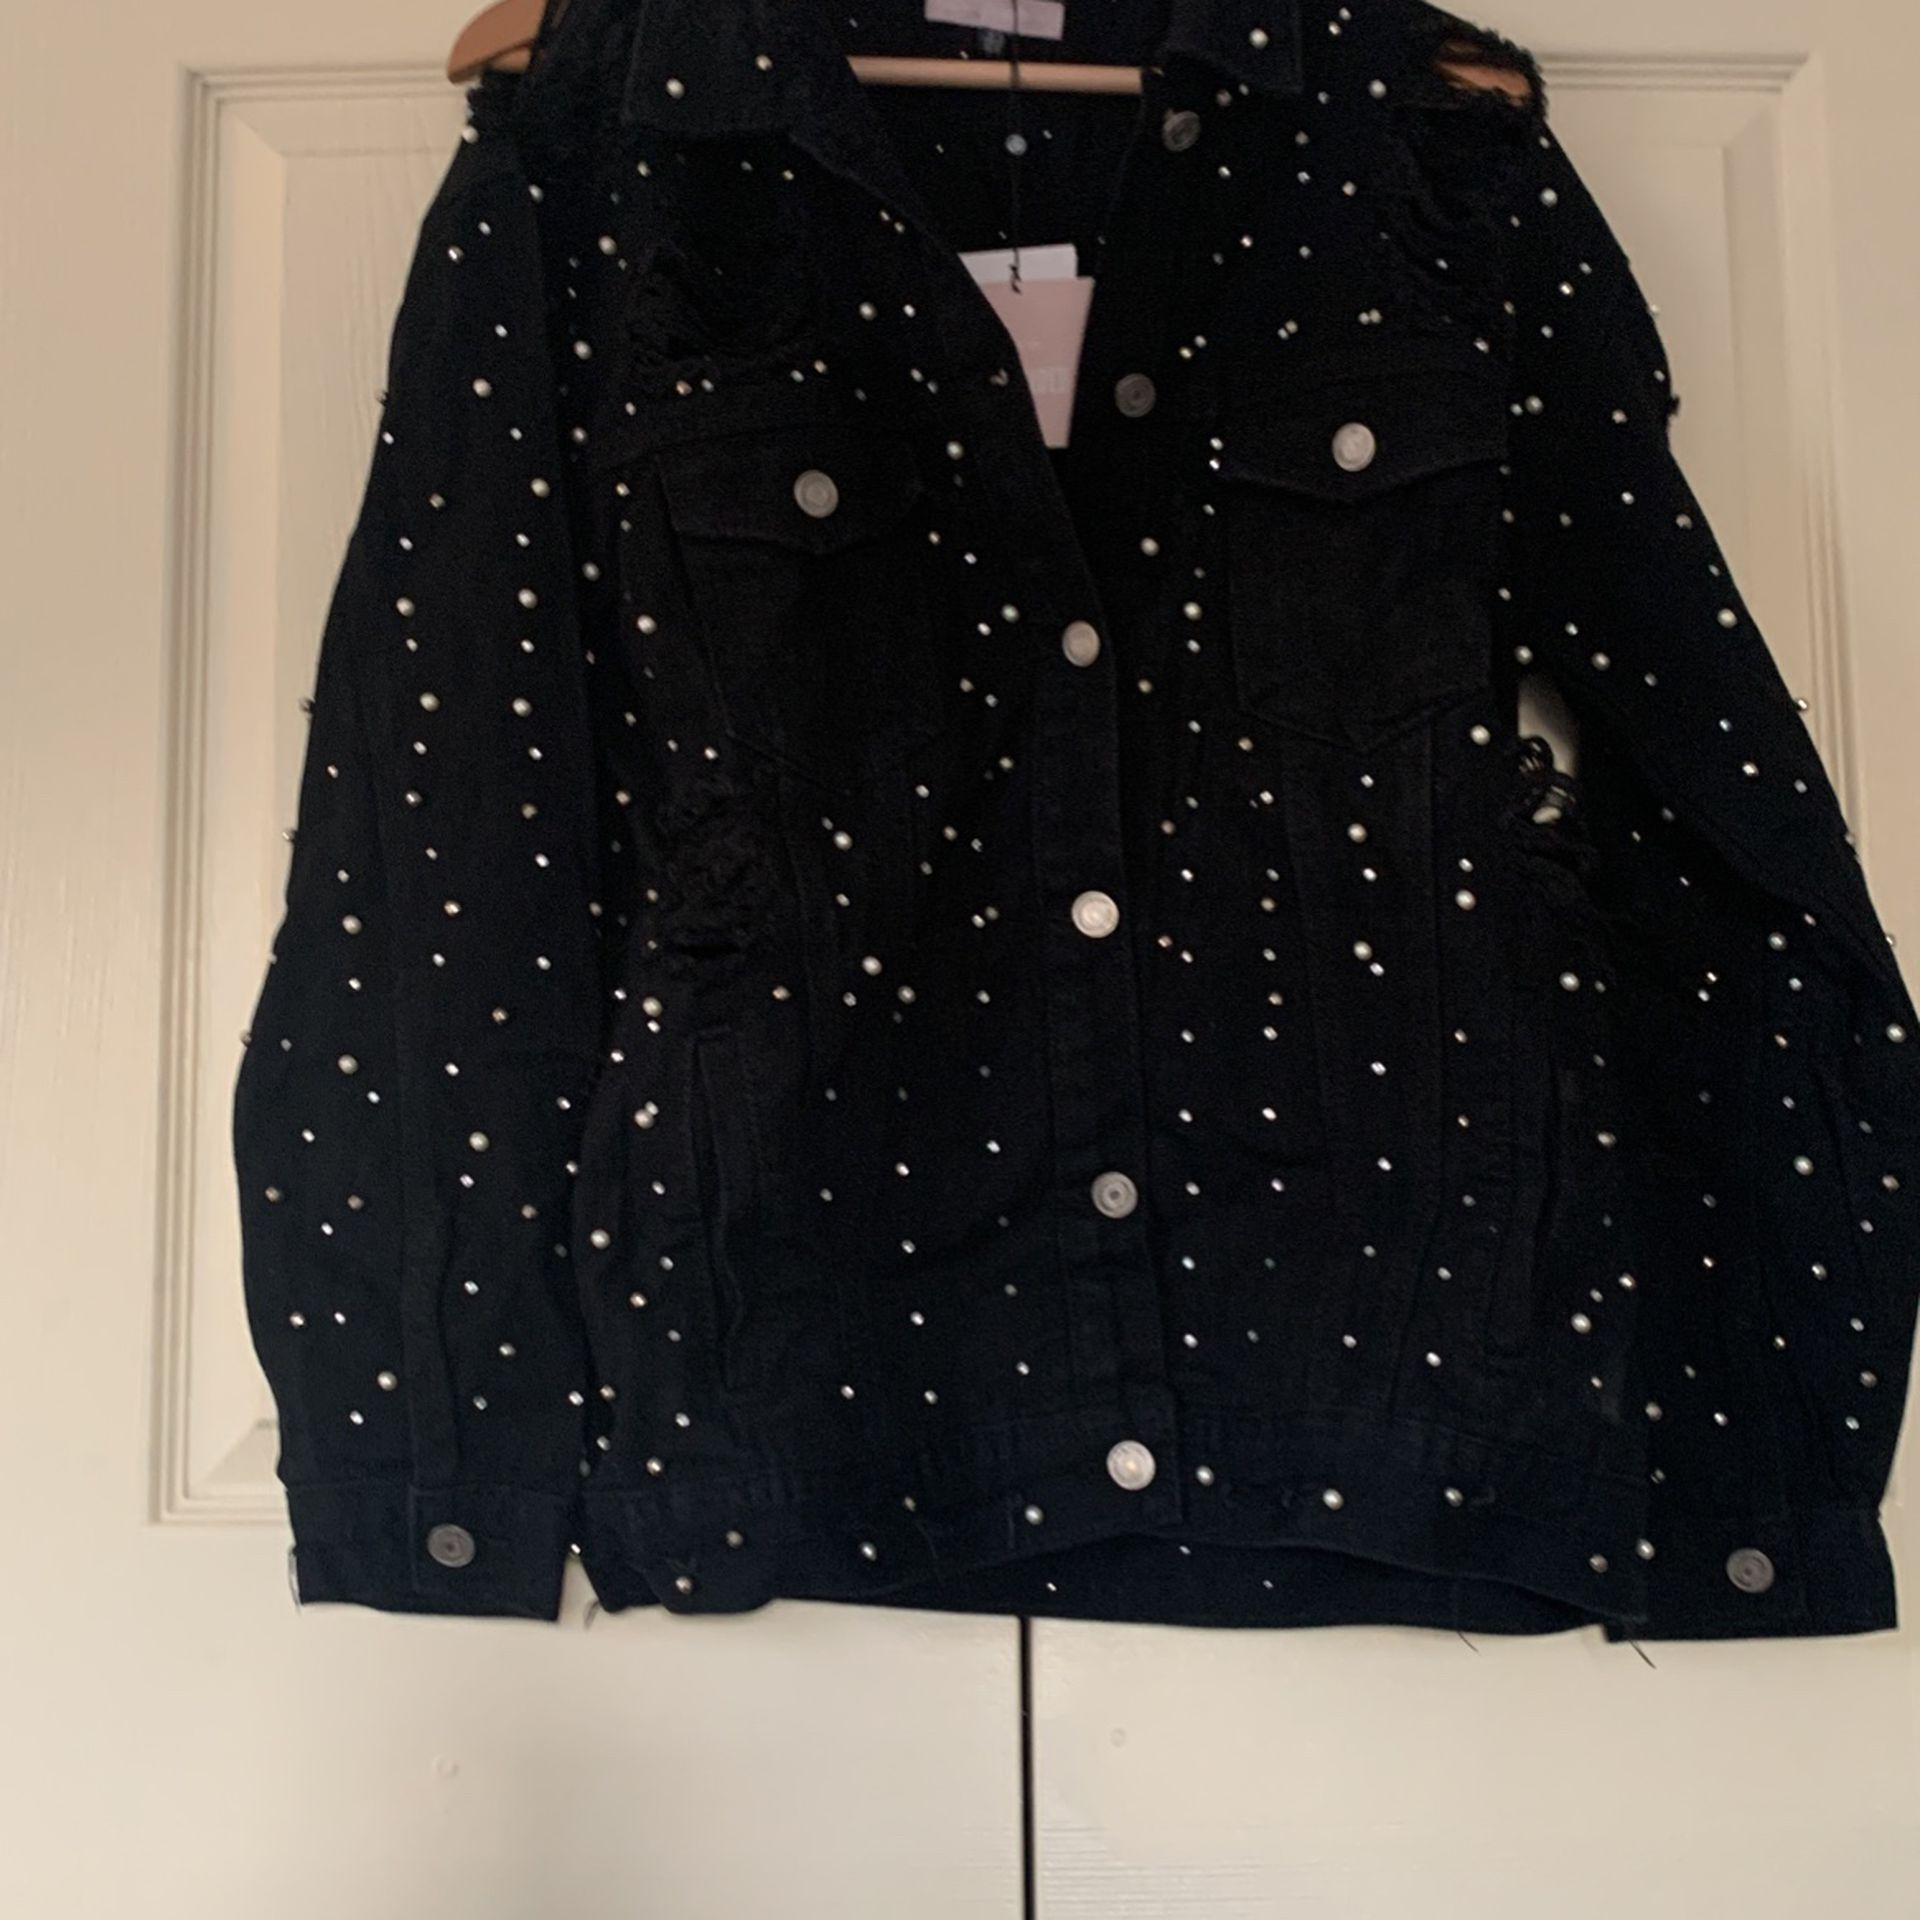 Carli Bybel X Misguided Jacket